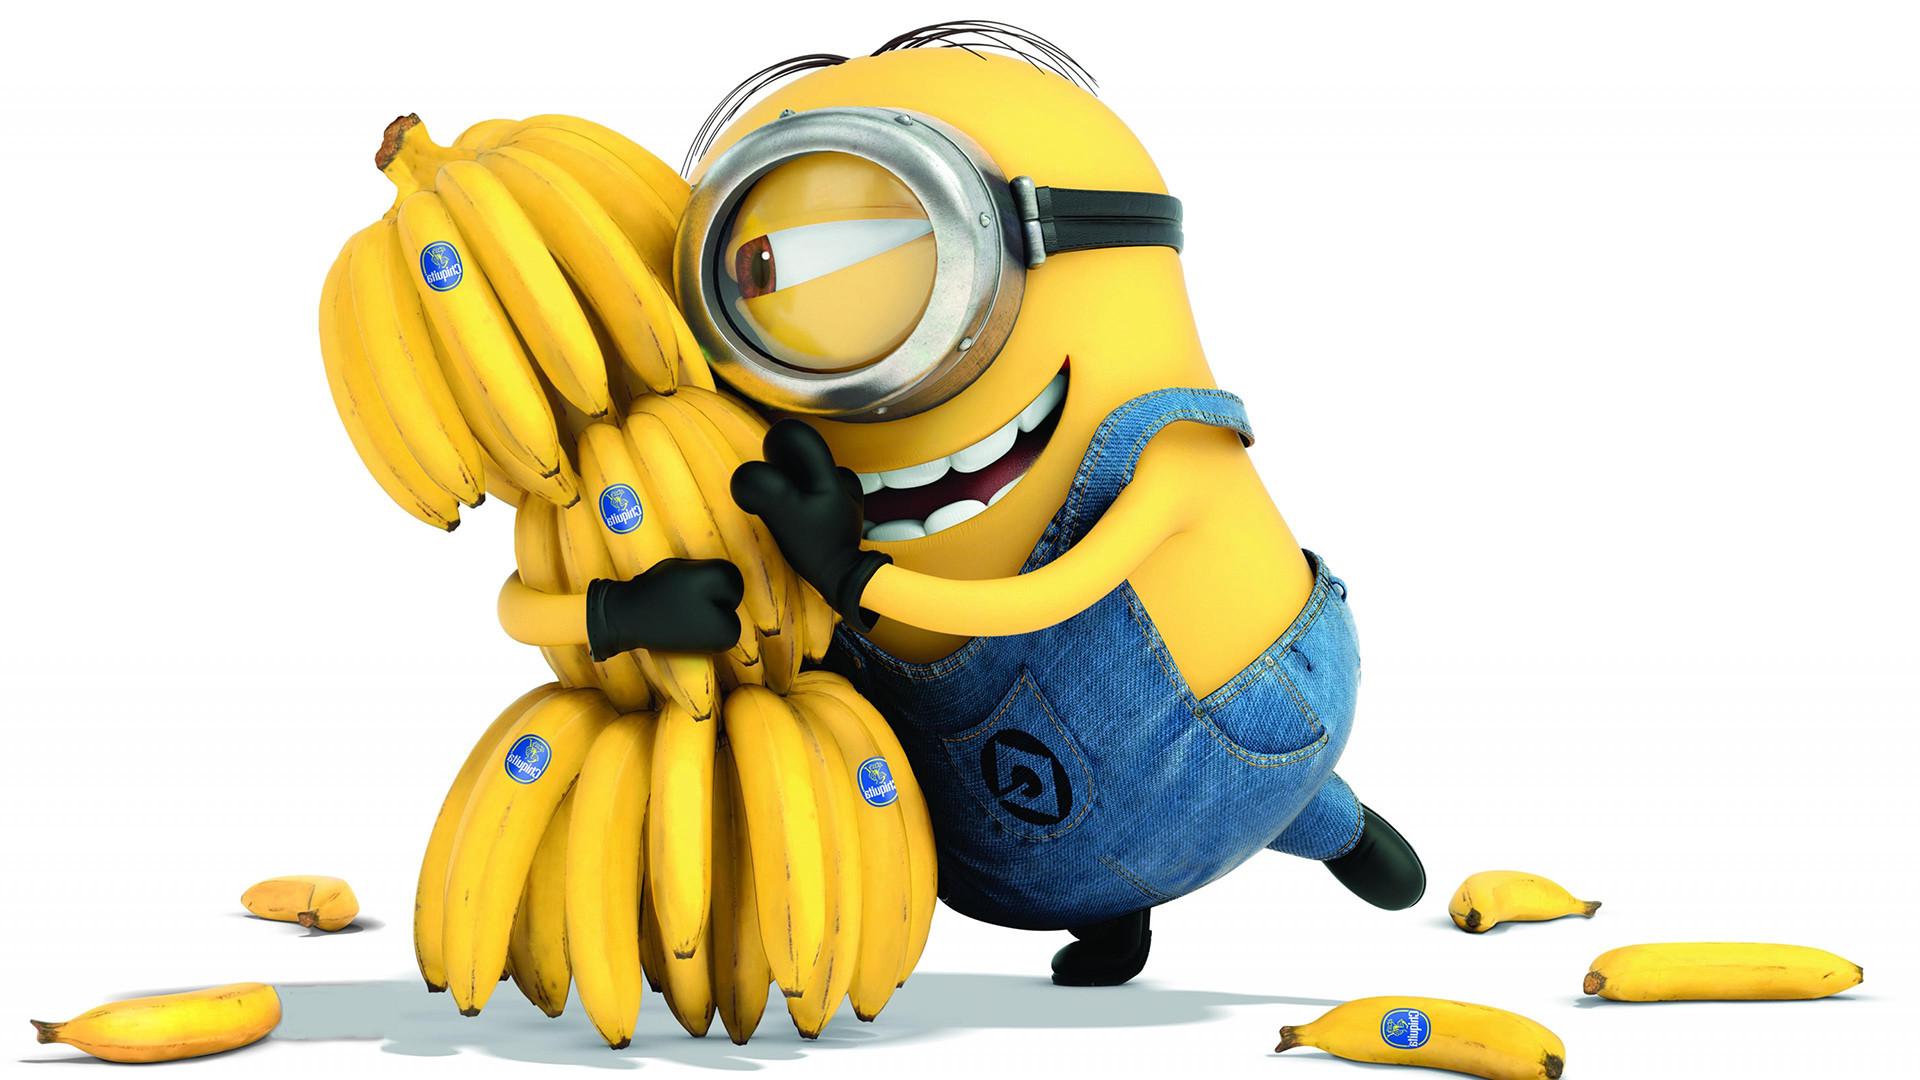 Minions Love Banana 2015 Movie HD Wallpapers